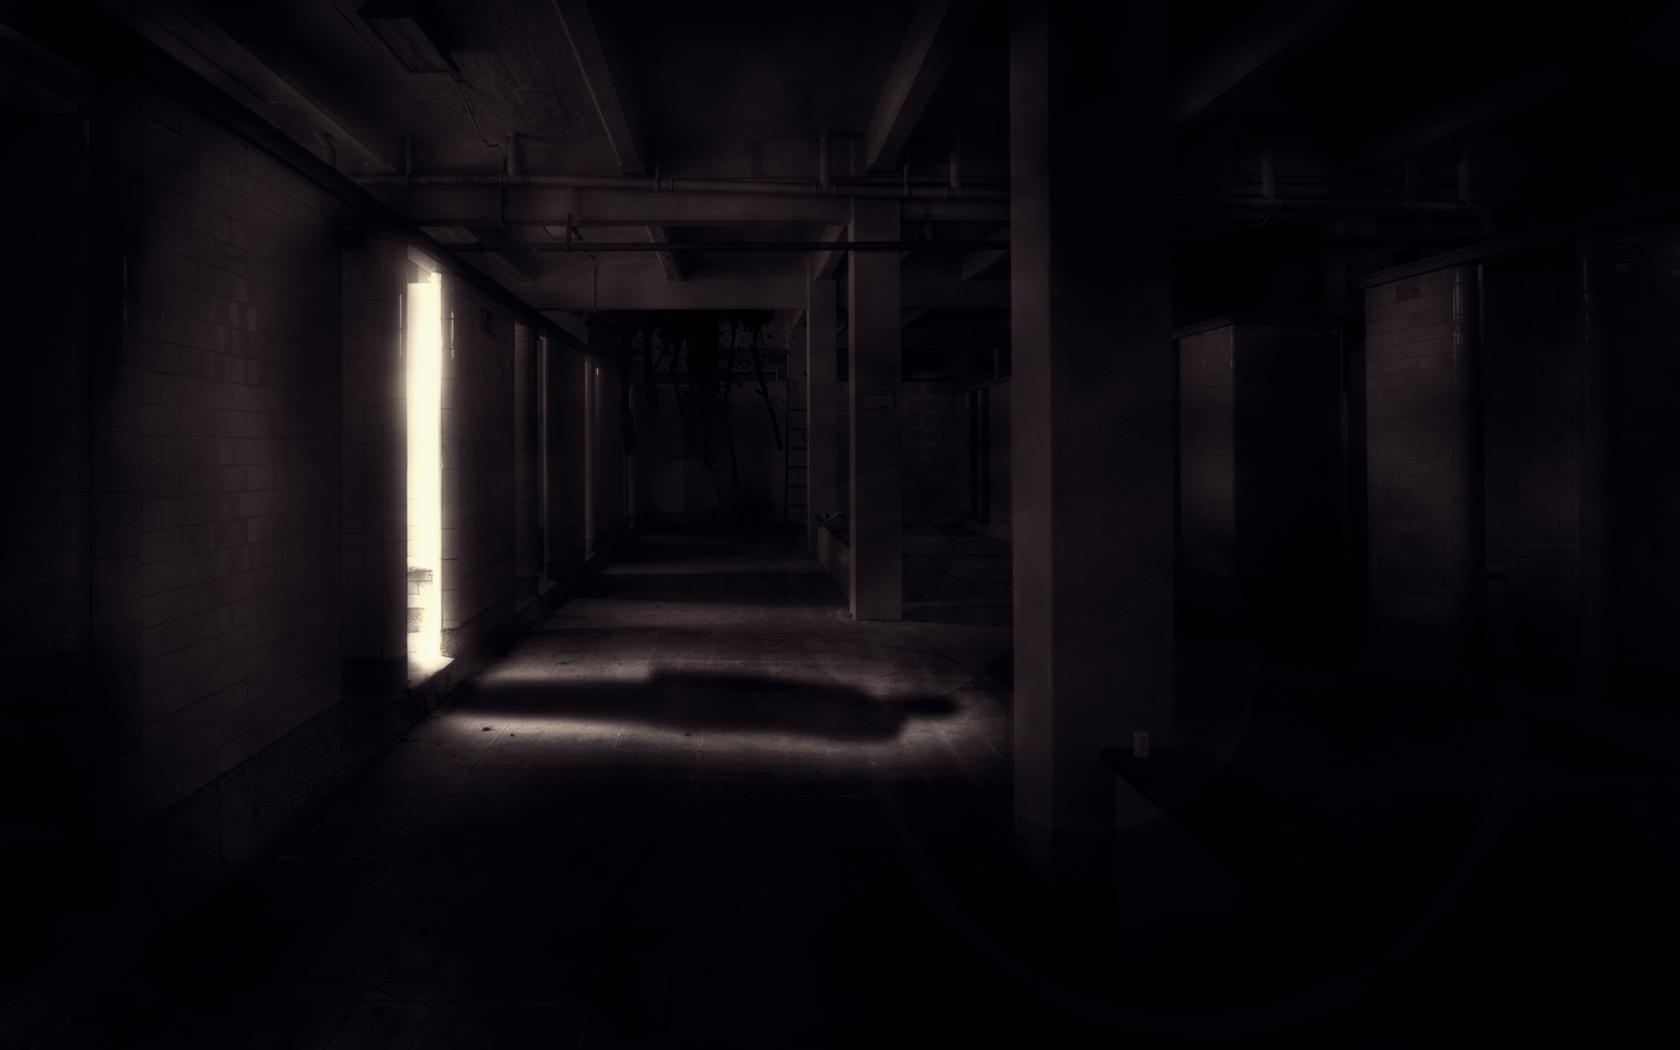 dark shadow in doorway creepy HD Wallpaper   General 392551 1680x1050